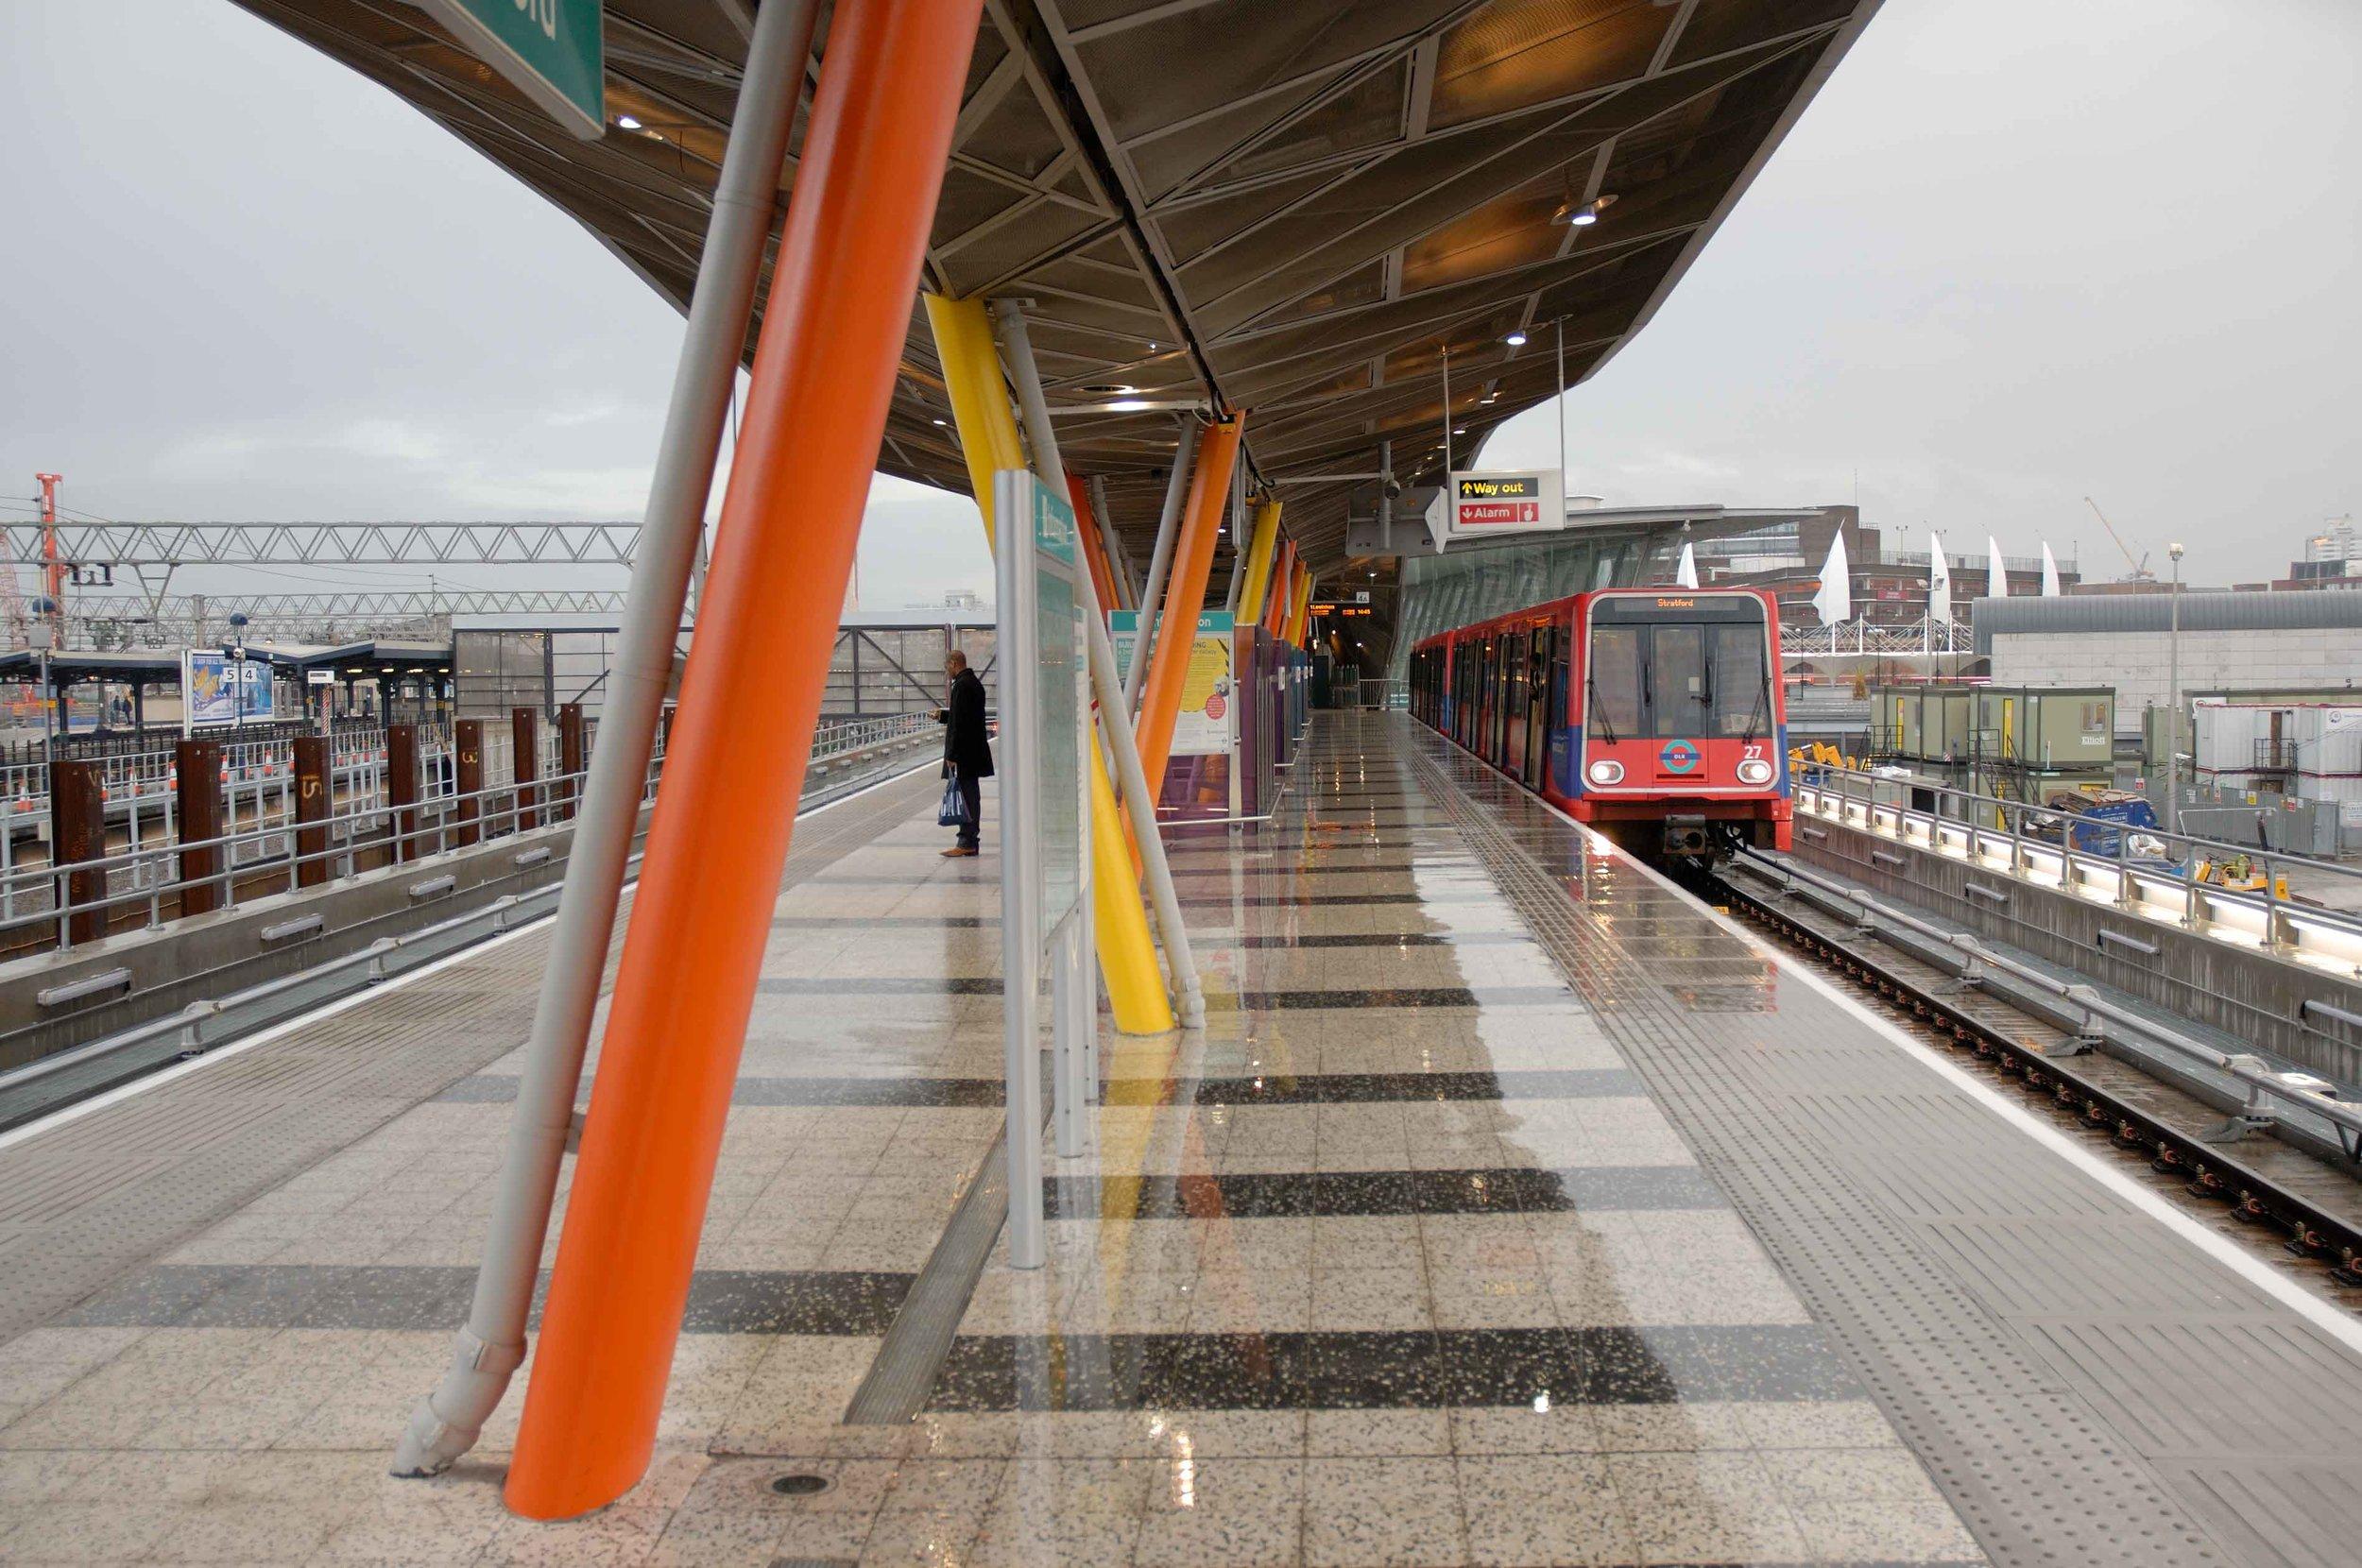 Stratford DLR station architecture